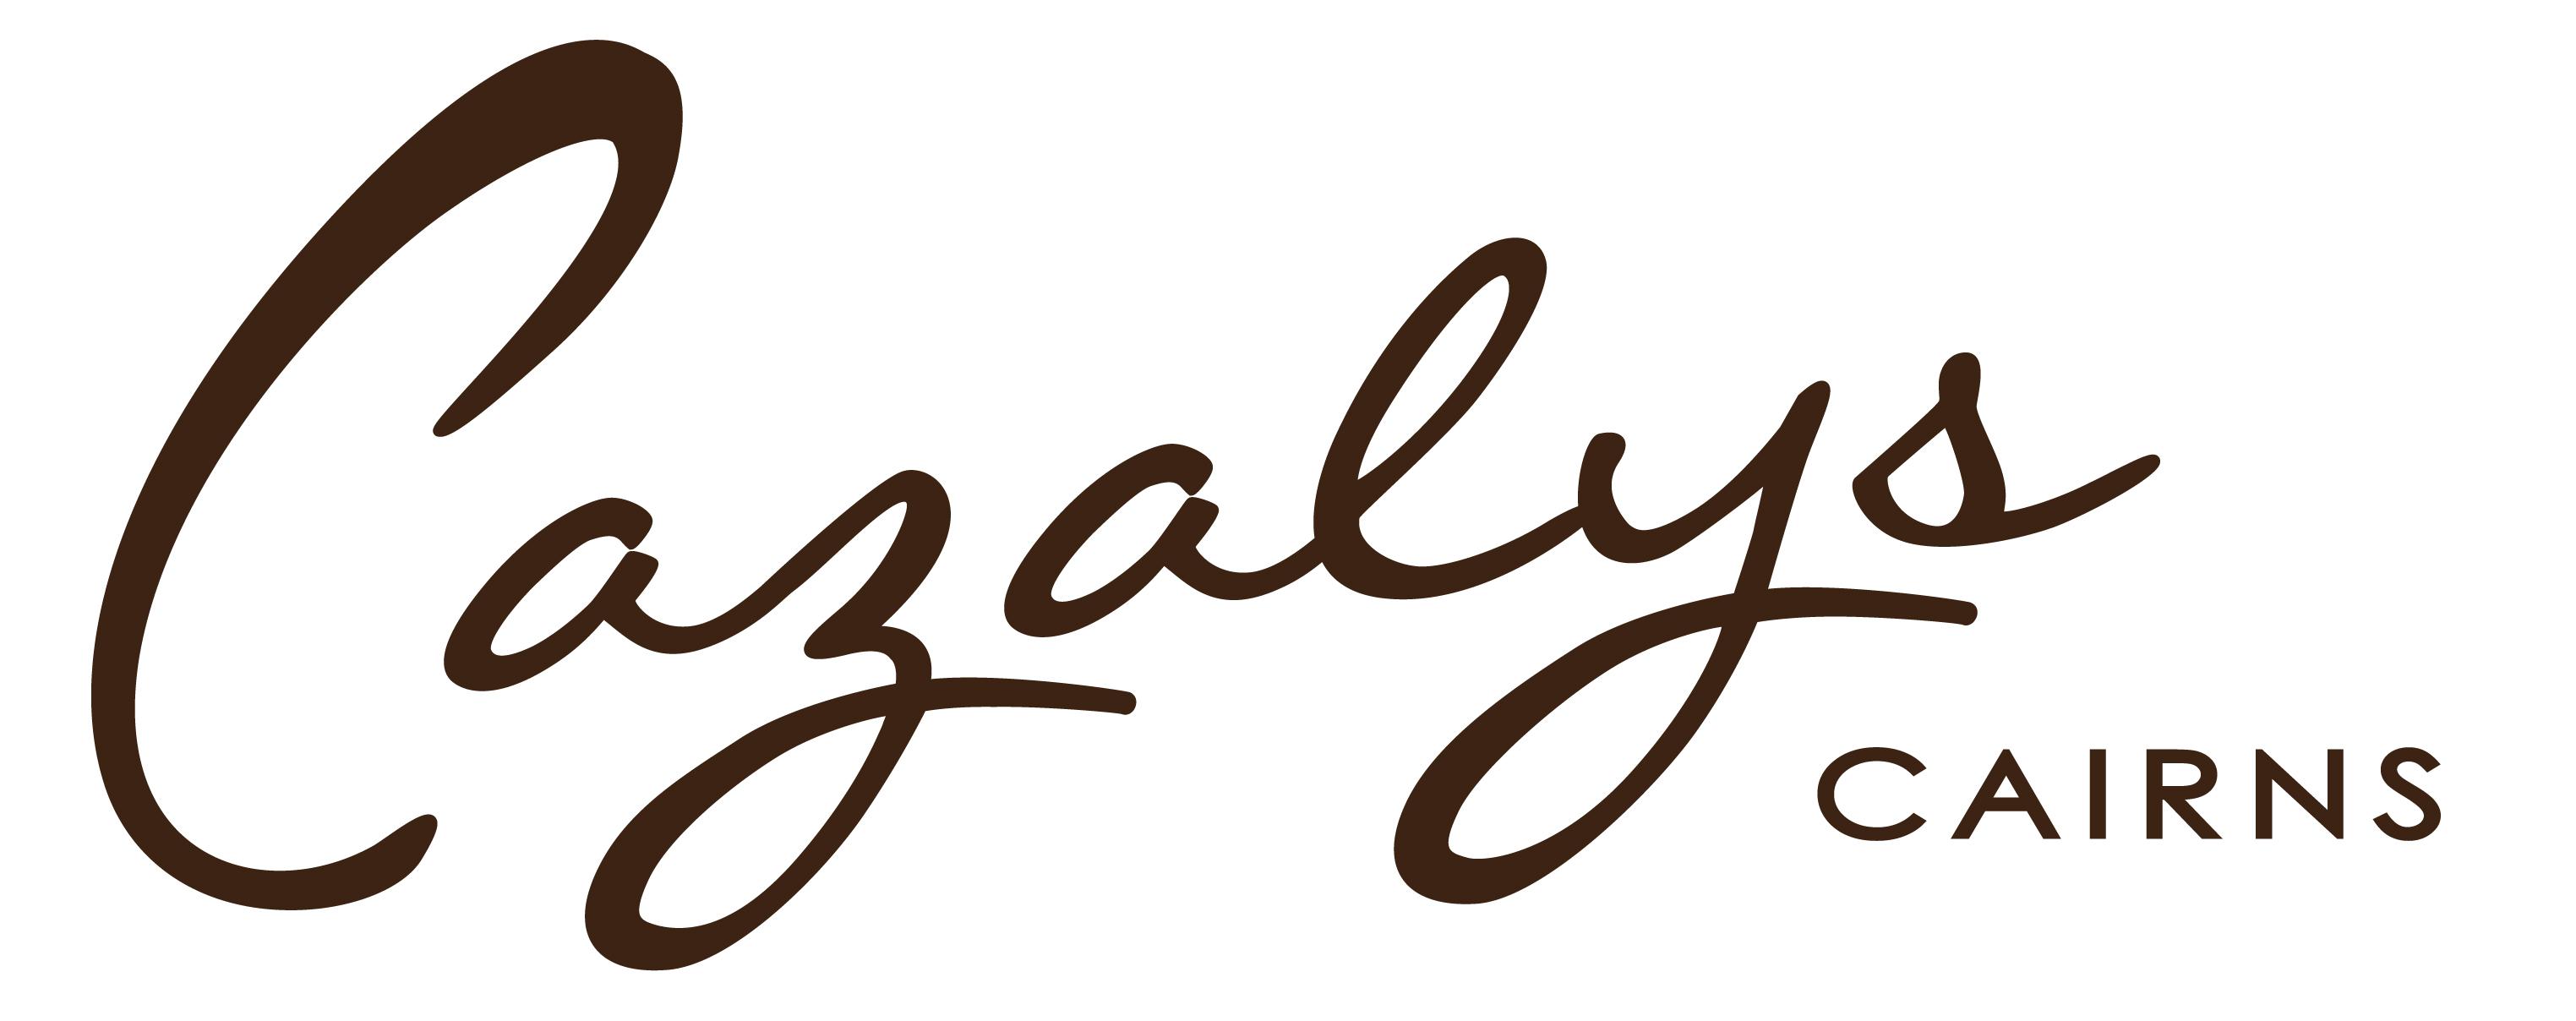 Cazalys Cairns logo 2013